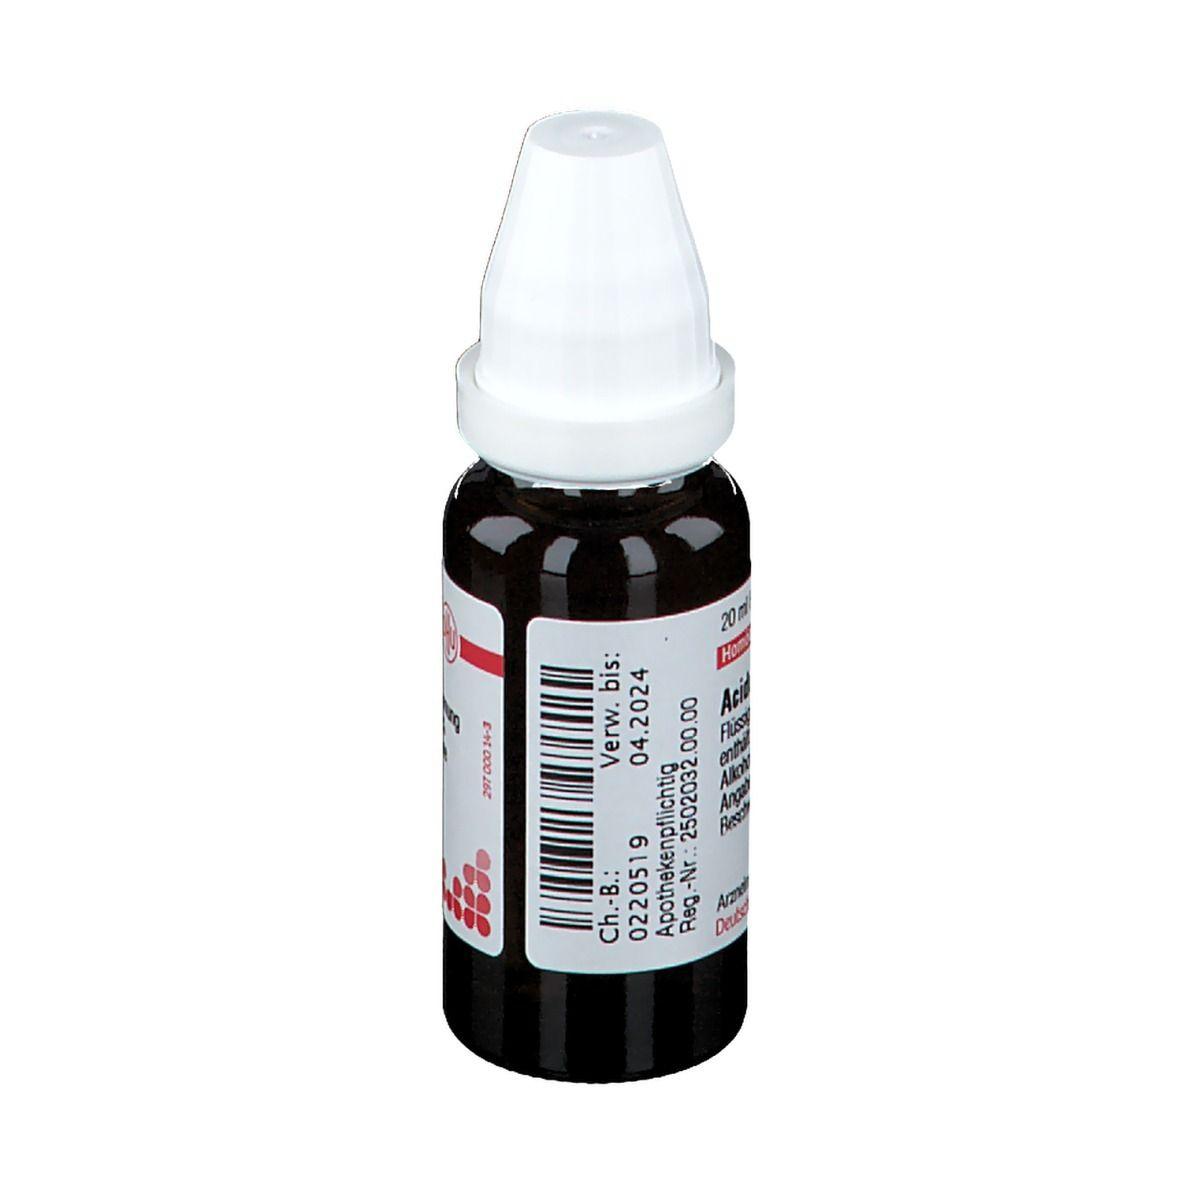 DHU Acidum Hydrofluoricum D6